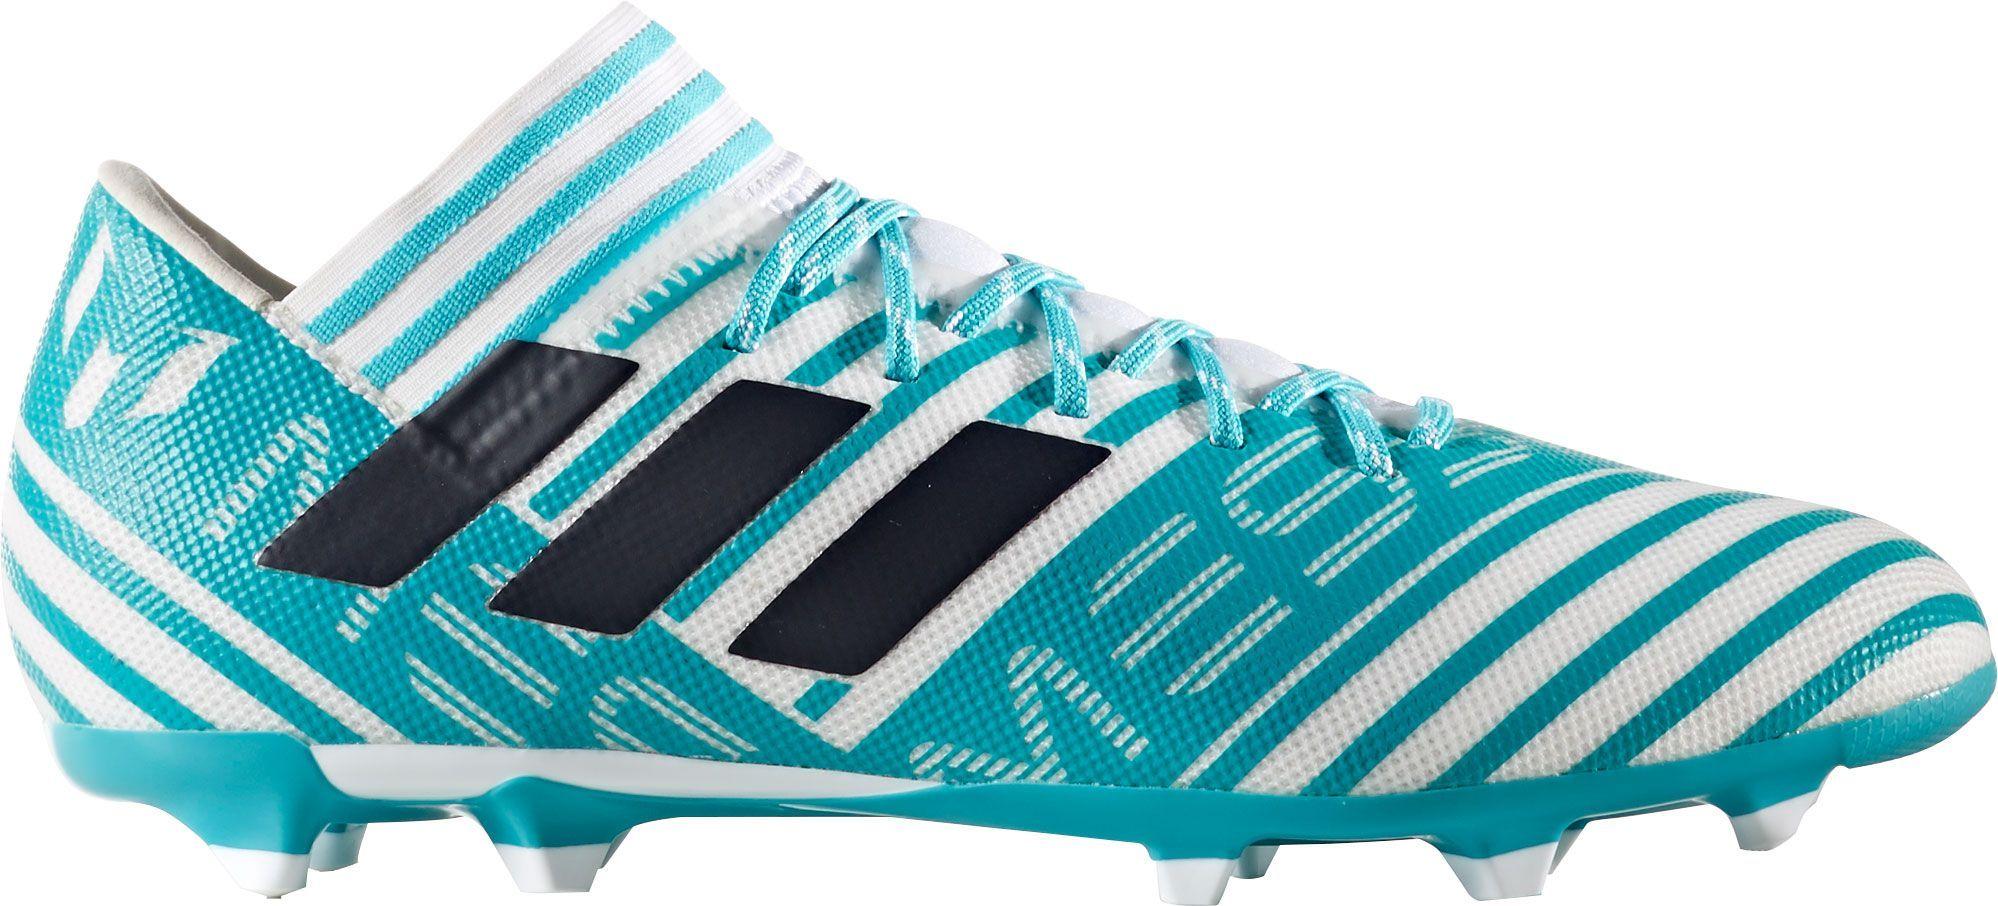 1309e4d1f44d4 adidas Men's Nemeziz Messi 17.3 FG Soccer Cleats | Products | Soccer ...